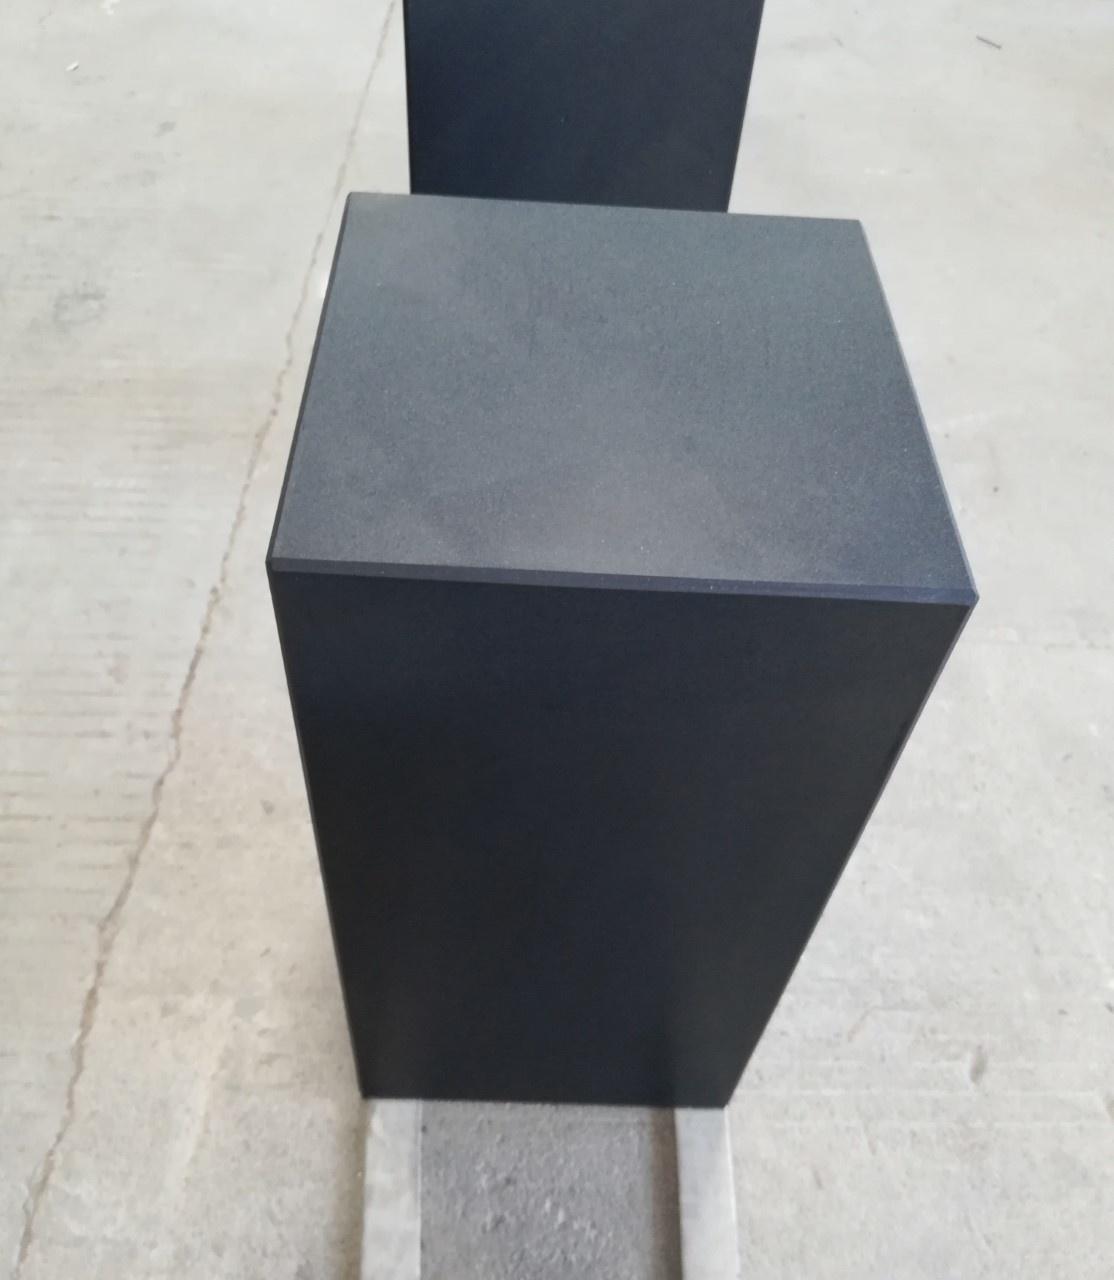 Eliassen Base black granite matt 30x30x85cm